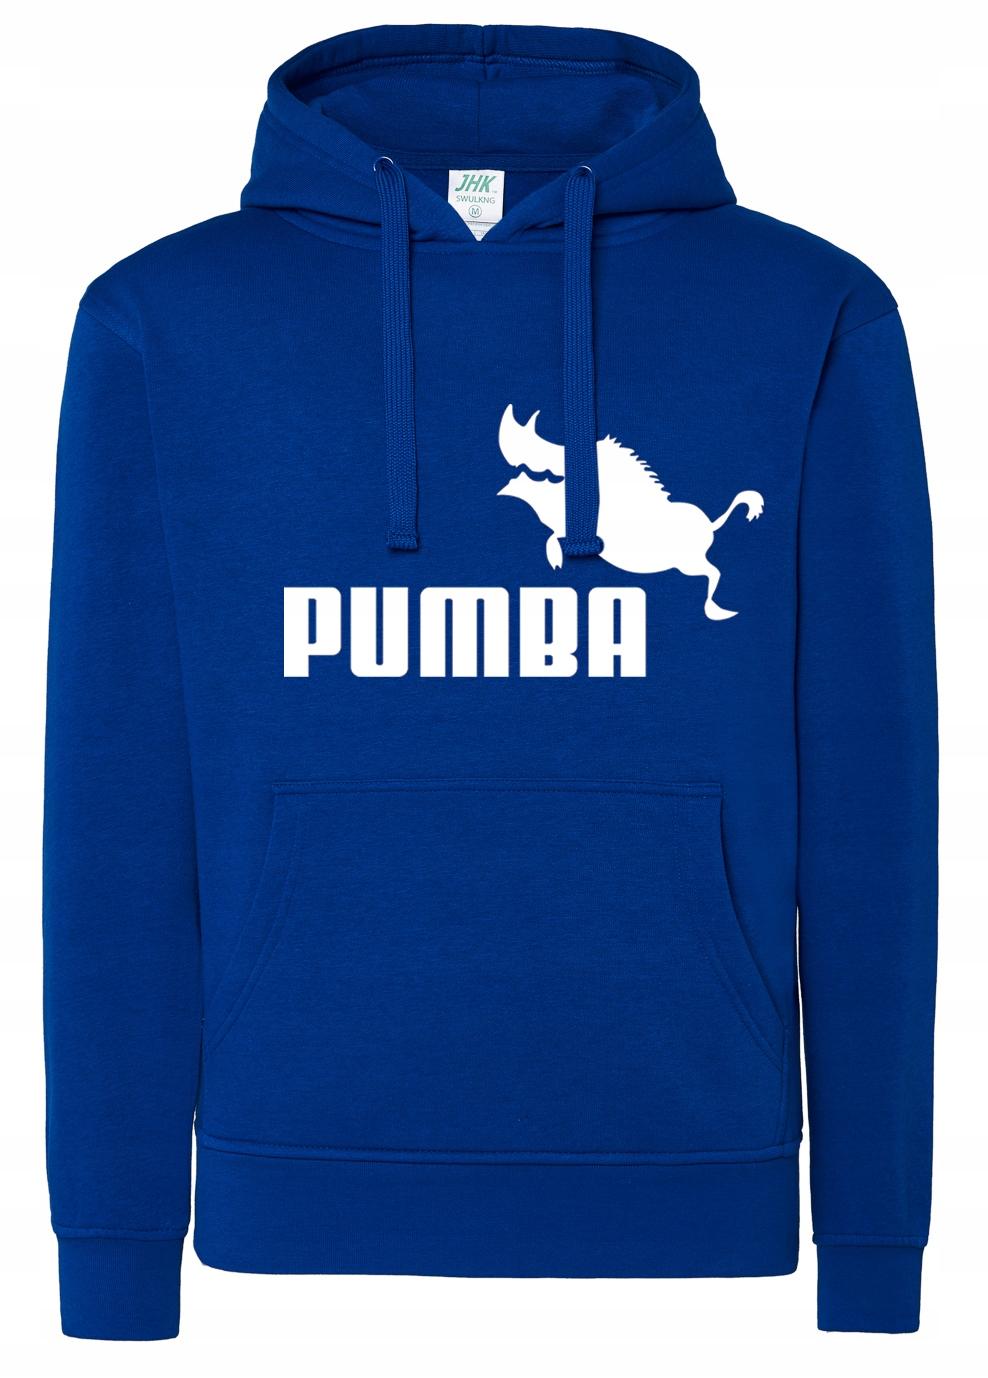 Damska Bluza z kapturem Pumba Jak Puma S Prezent